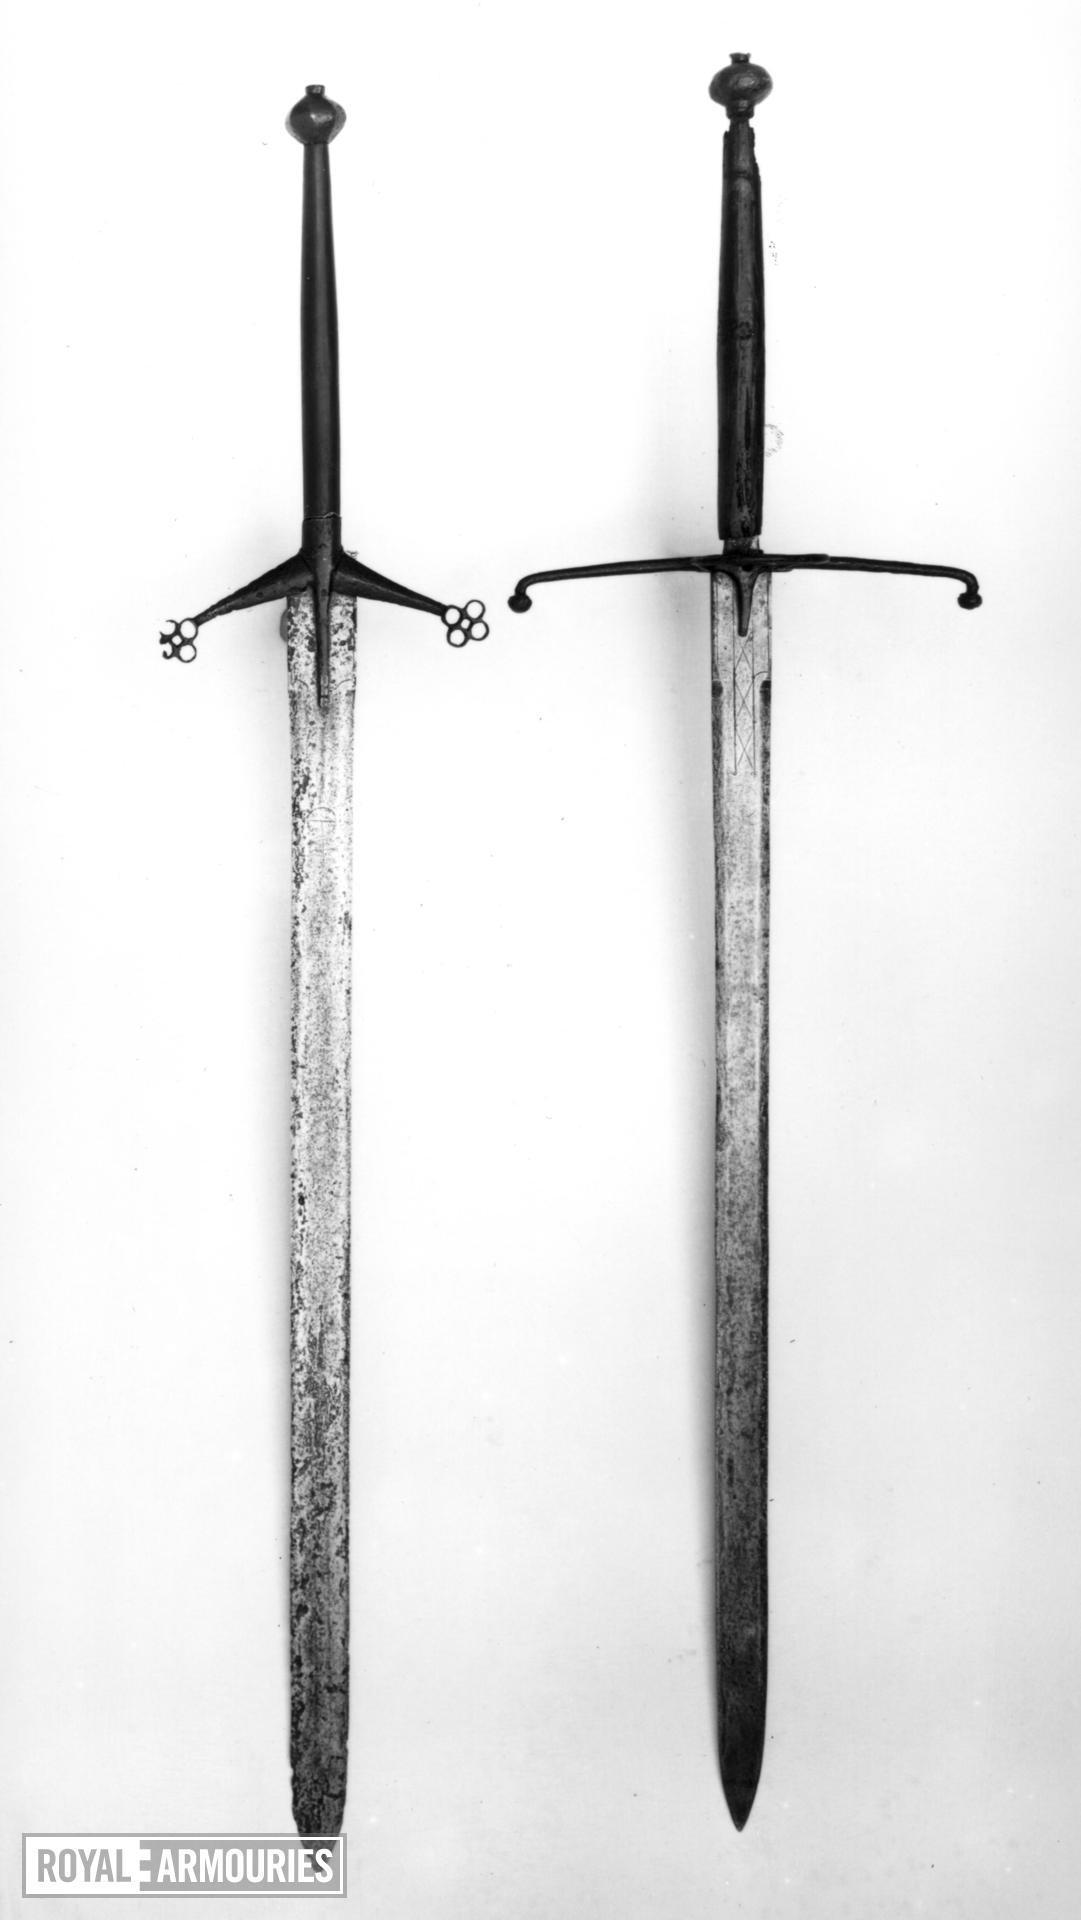 Sword Two-handed Highland sword (claidheamh da laimh). Popularly known as a 'claymore' (Gaelic: claidheamh mor)